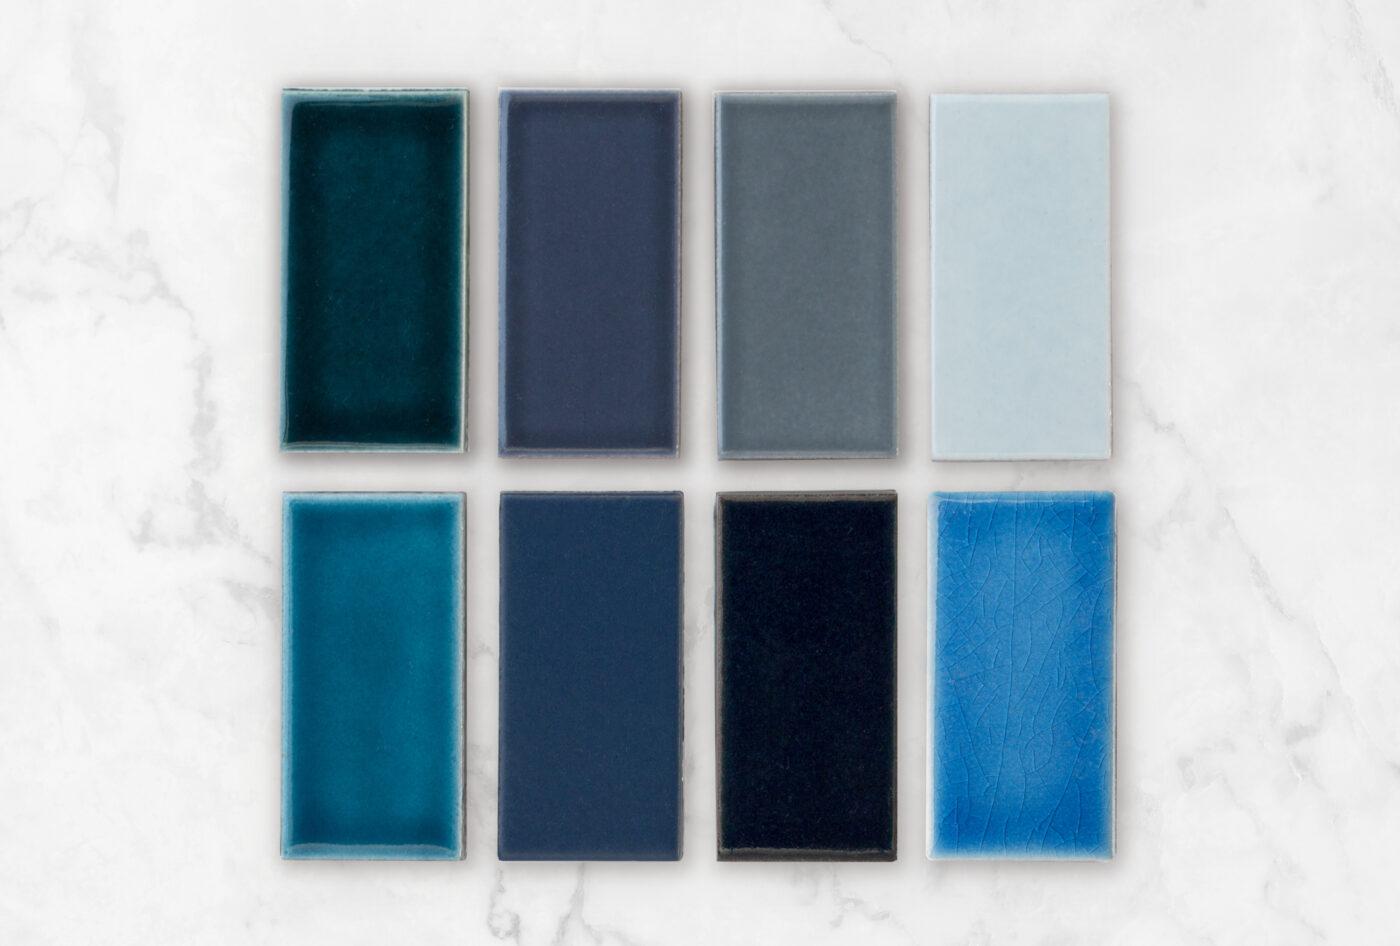 2020 Q1 Photo All Colors Favorites Blues Boundary Waters Slate Blue Nautical Crater Lake Adriatic Sea Blue Velvet Navy Blue Aegean Sea